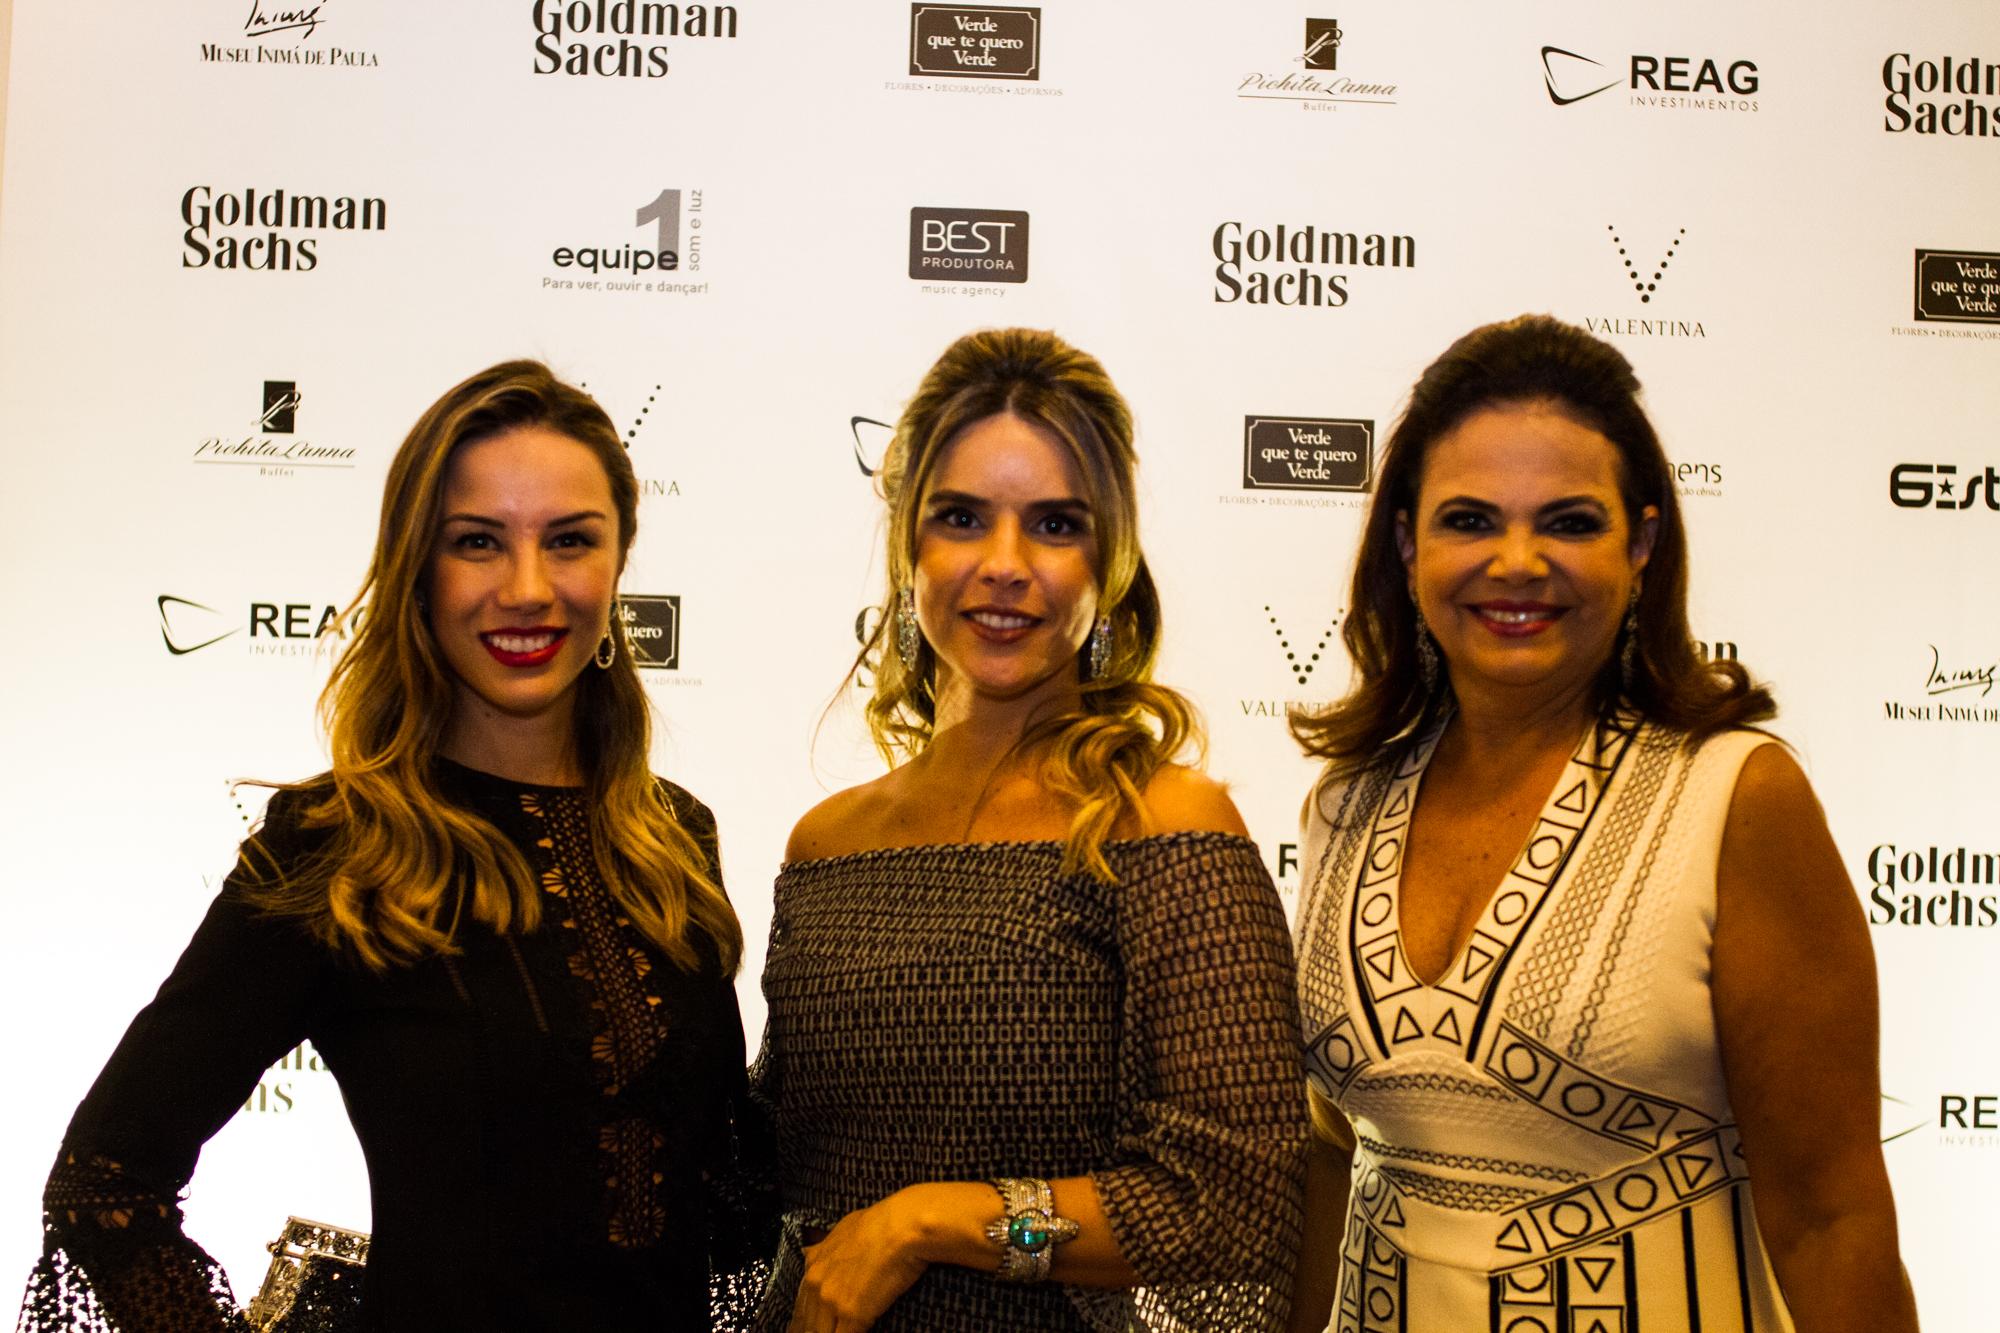 Valentina Joias, Ana Paula Carneiro, BrazilFoundation Jantar para Minas Gerais, Belo Horizonte